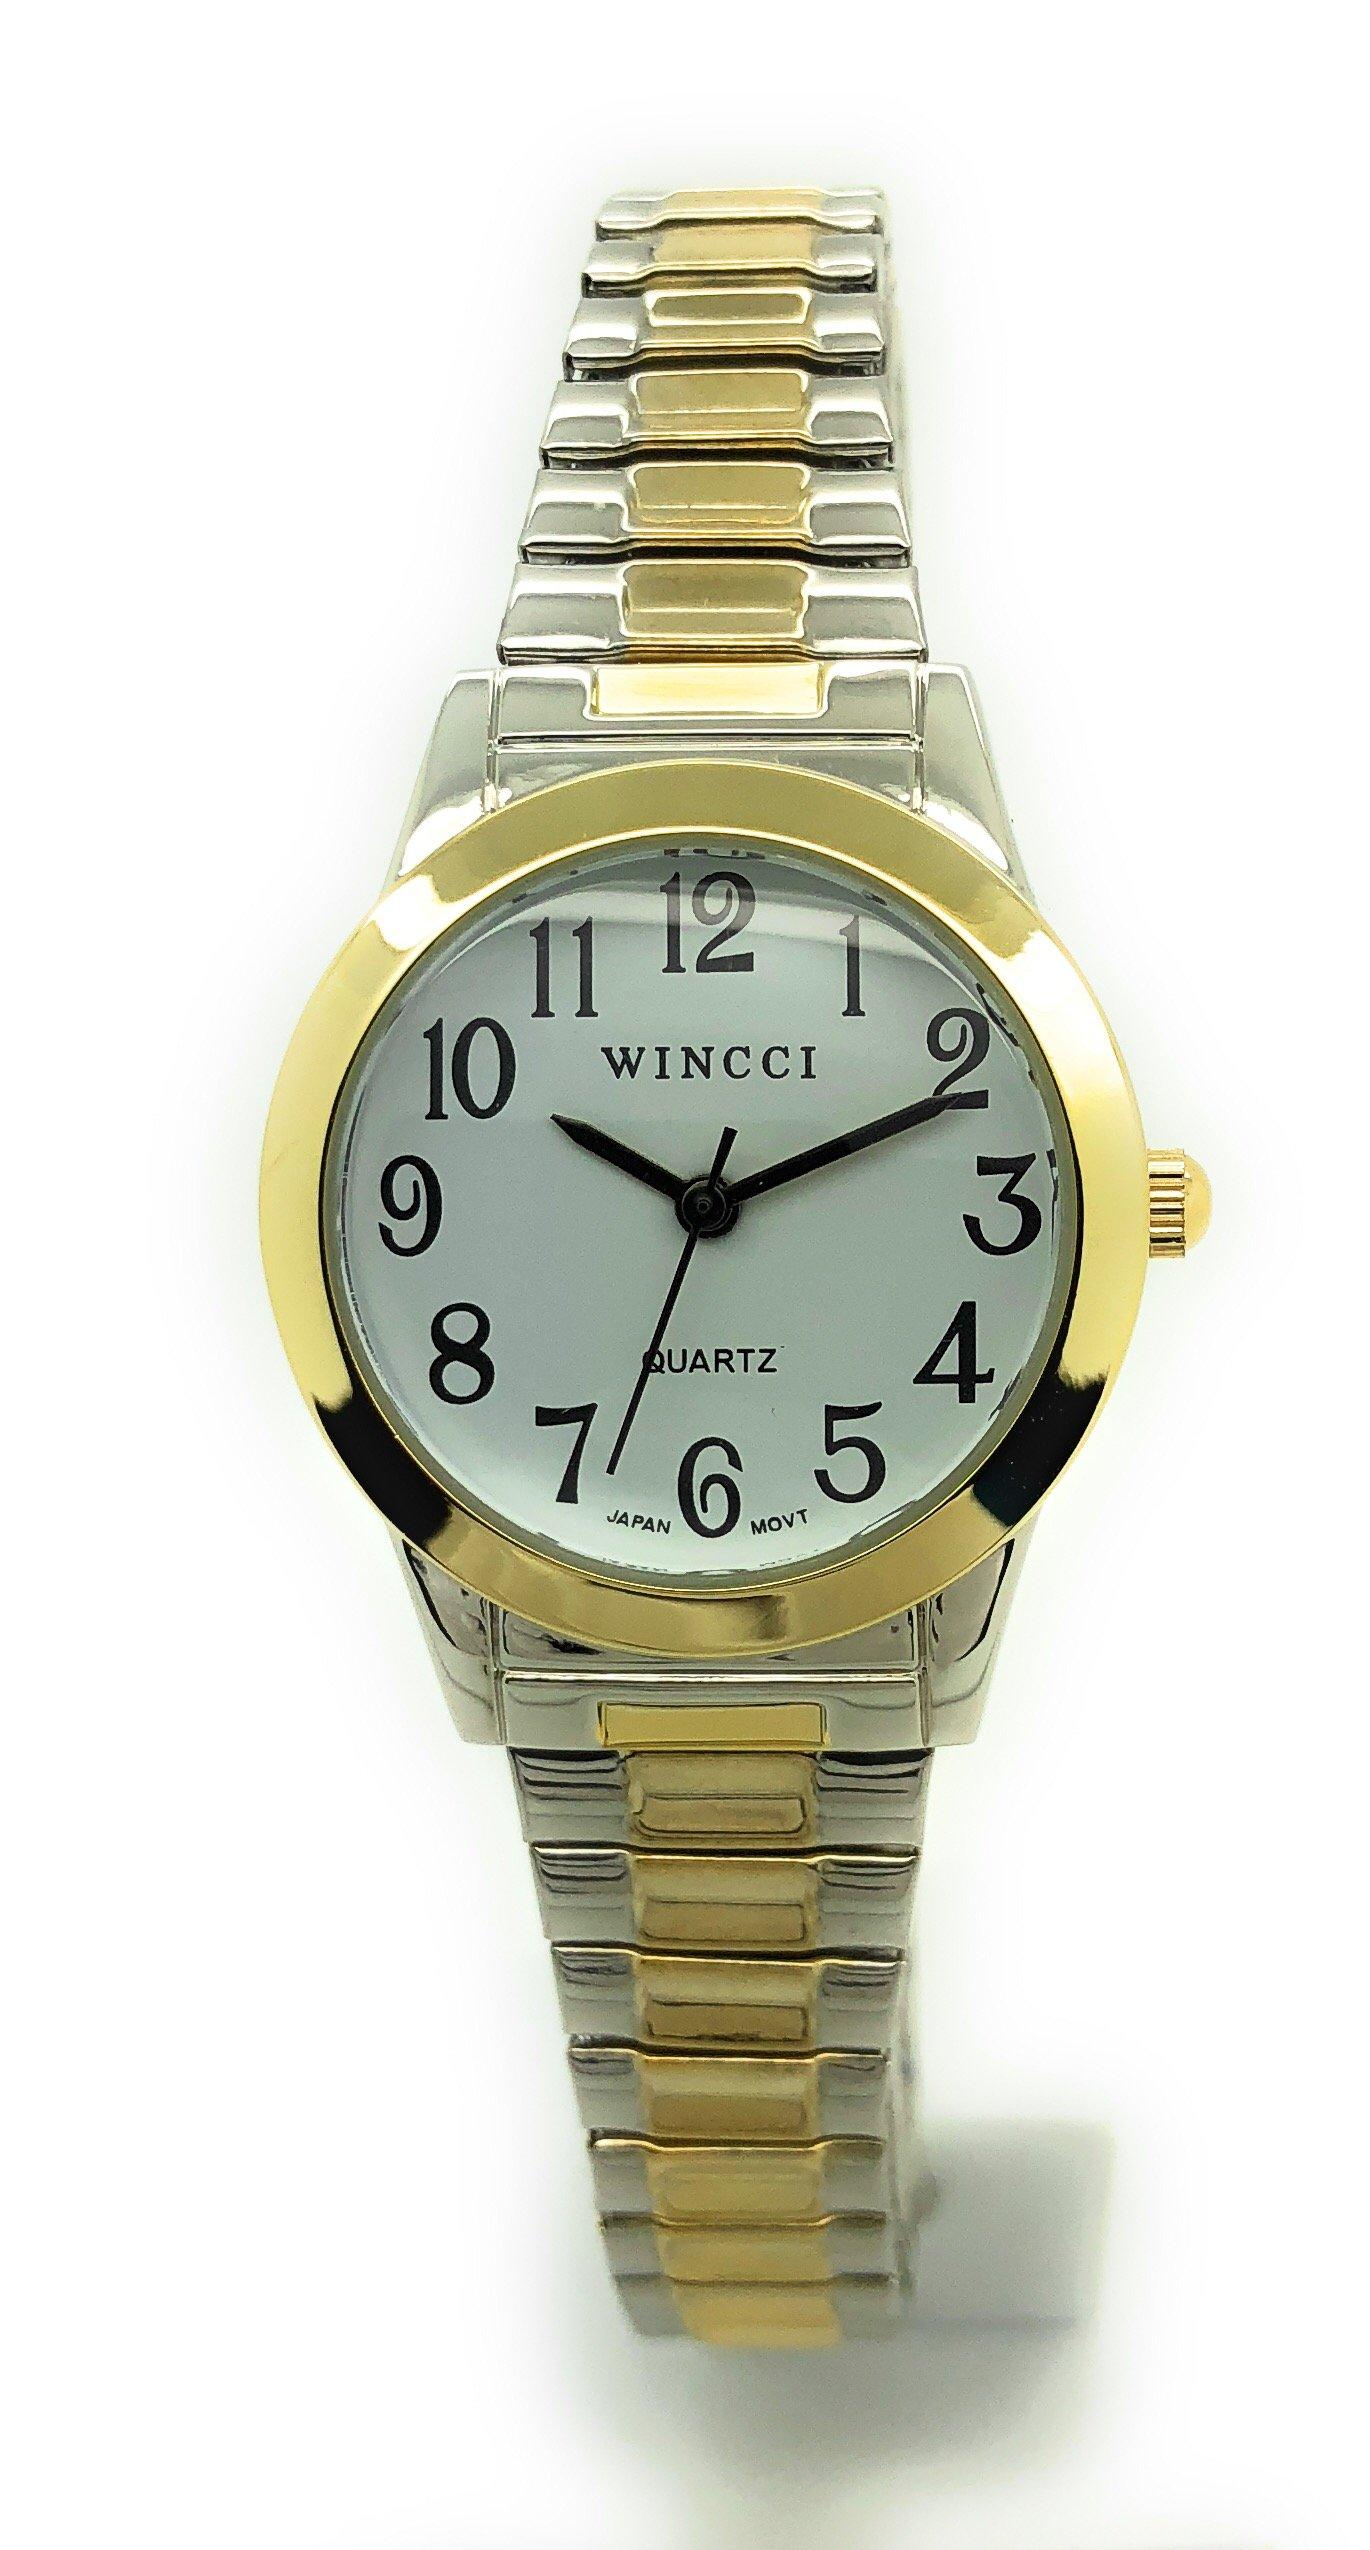 Ladies Classic Round Stretch Elastic Band Fashion Watch Wincci (Two Tone) by Wincci (Image #1)